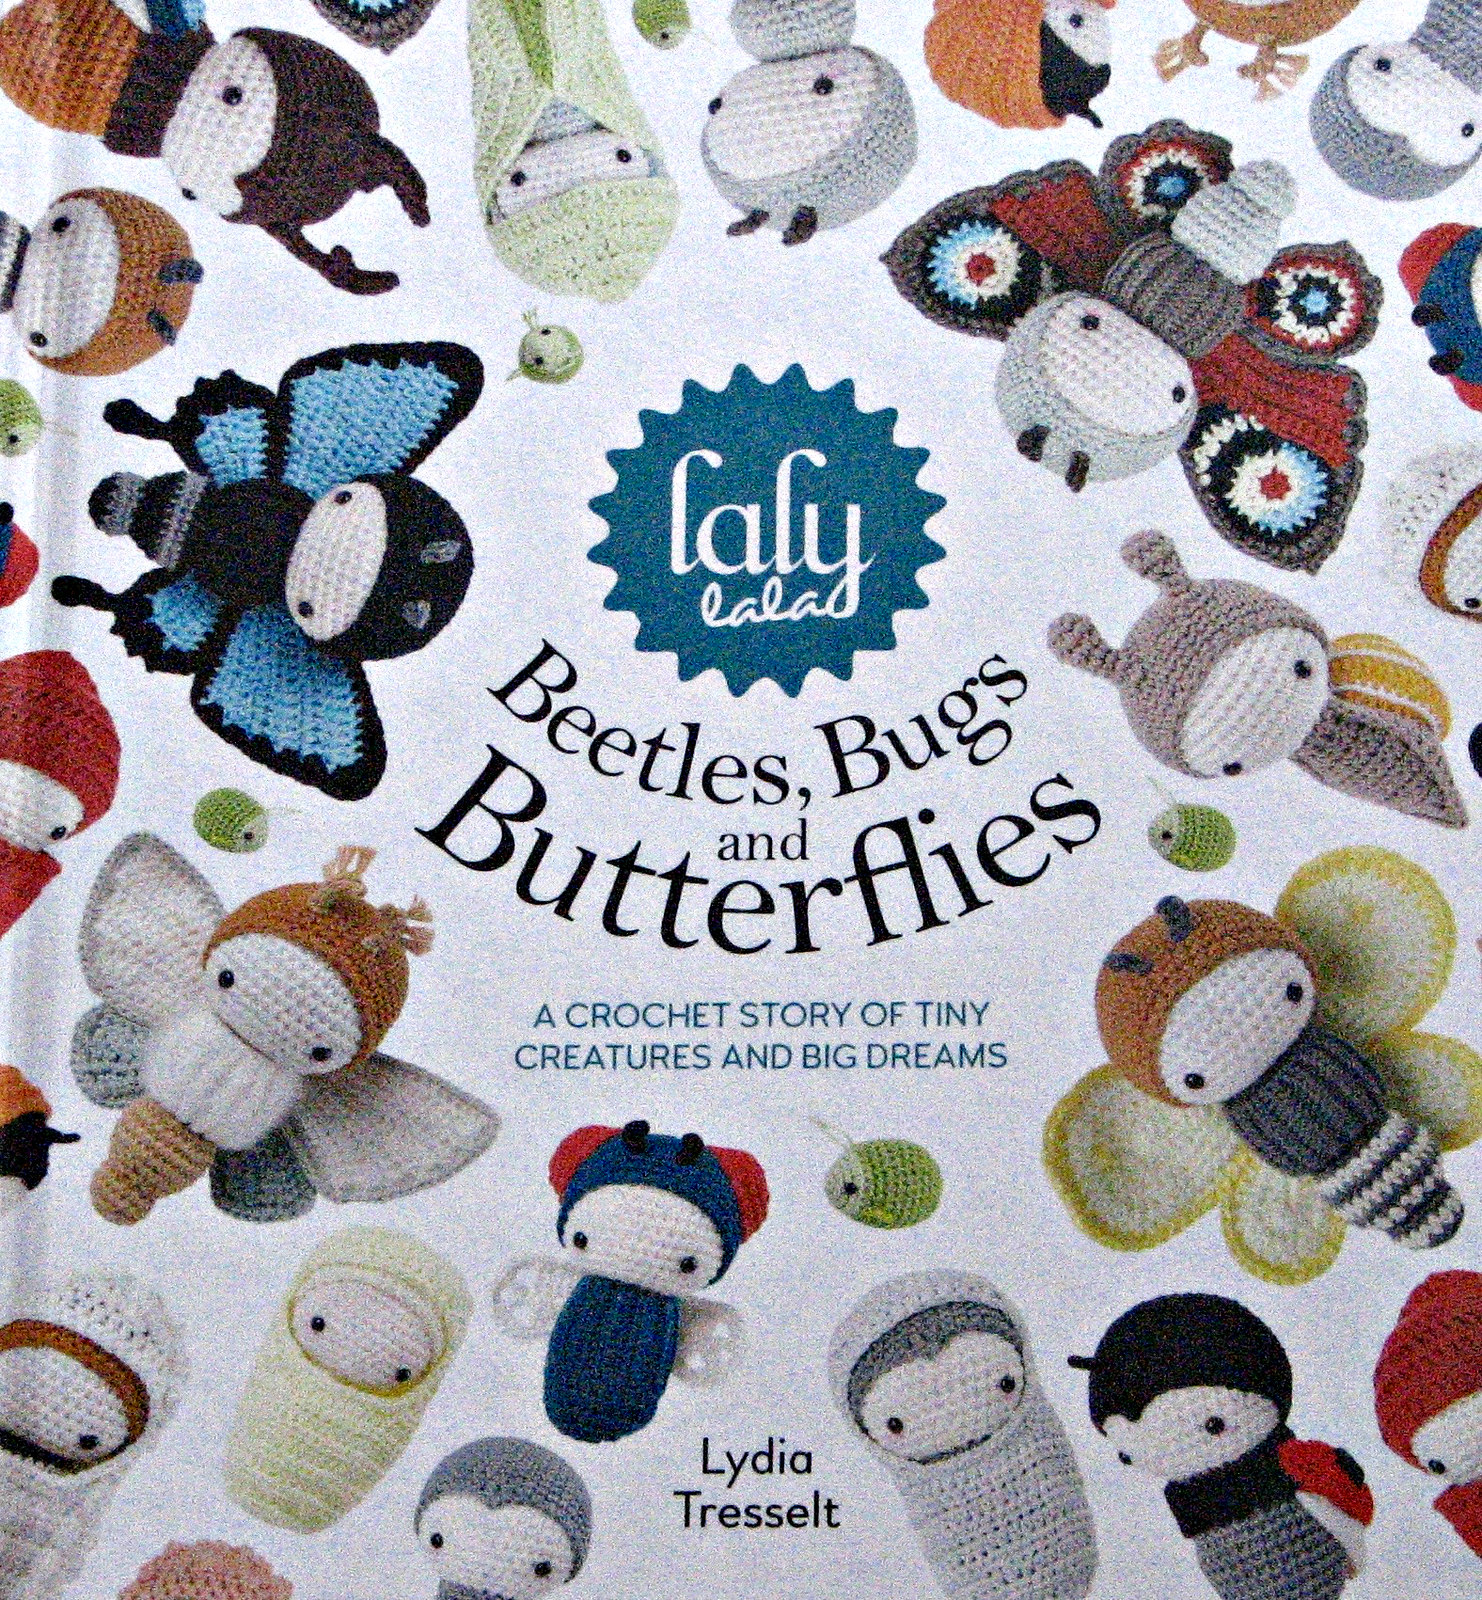 Beetles, Bugs and Butterflies